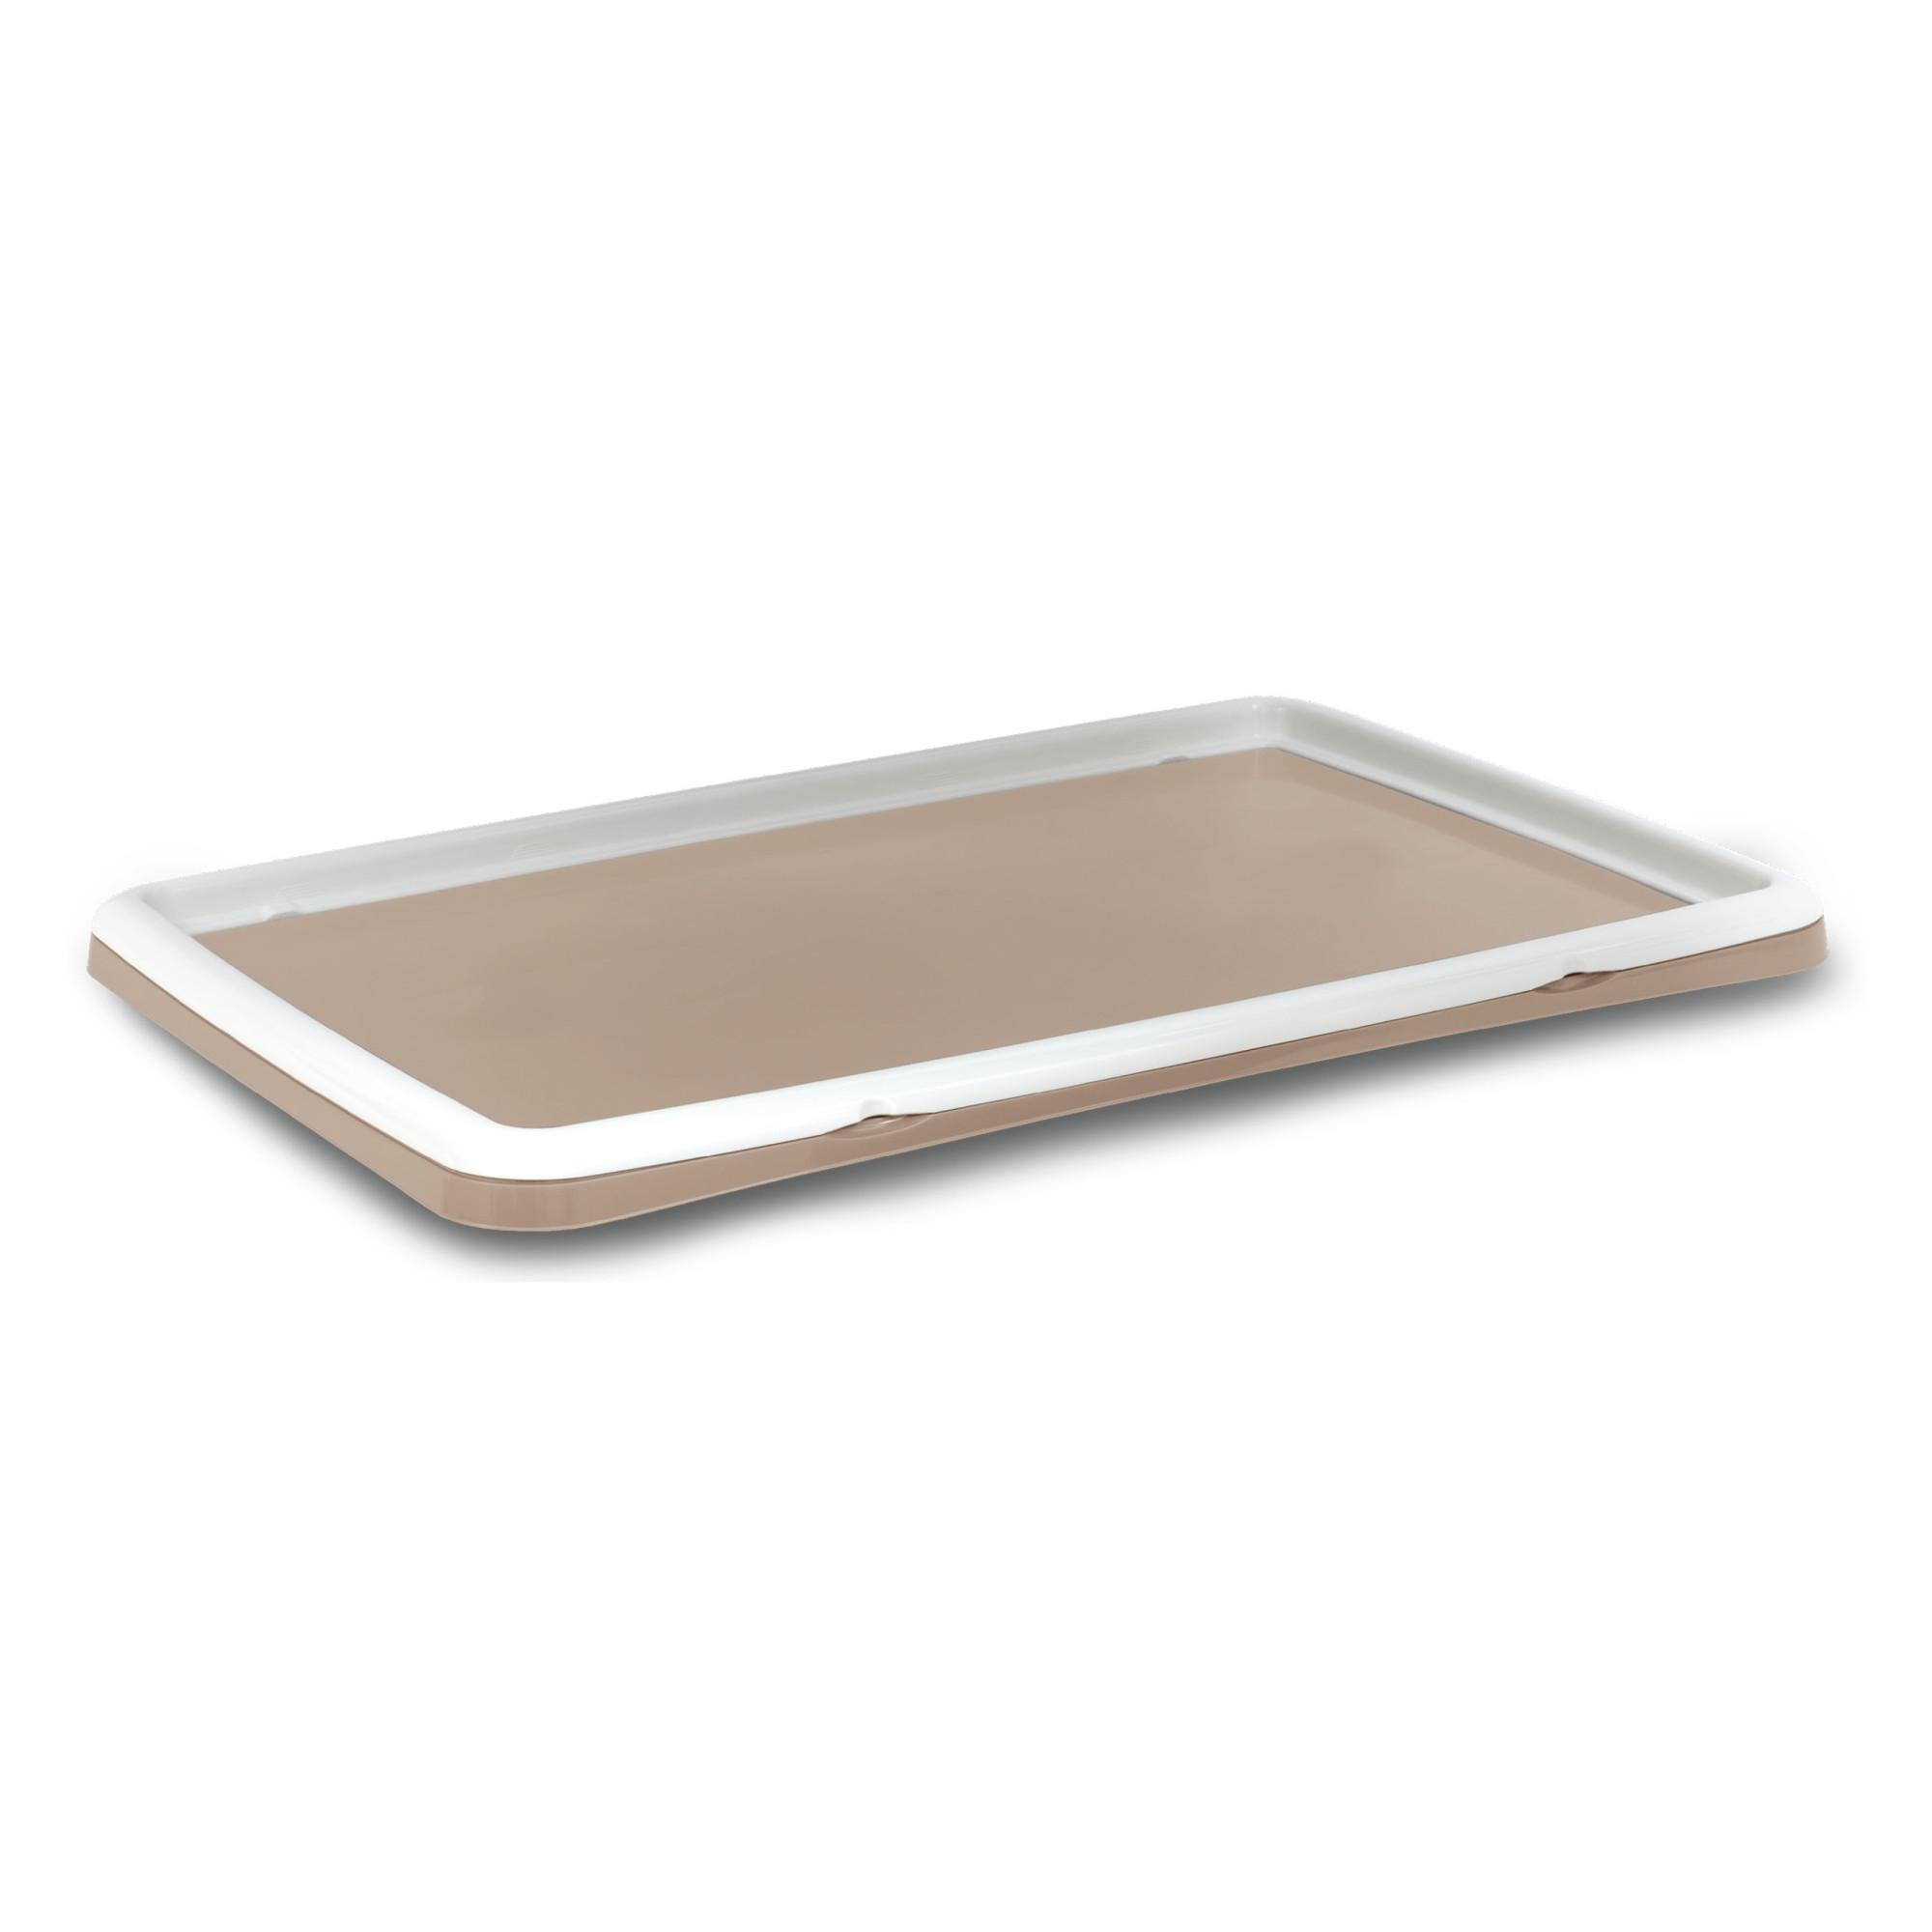 Suport pentru asternut absorbant , Gastone L, 59 x 89 x 4 cm